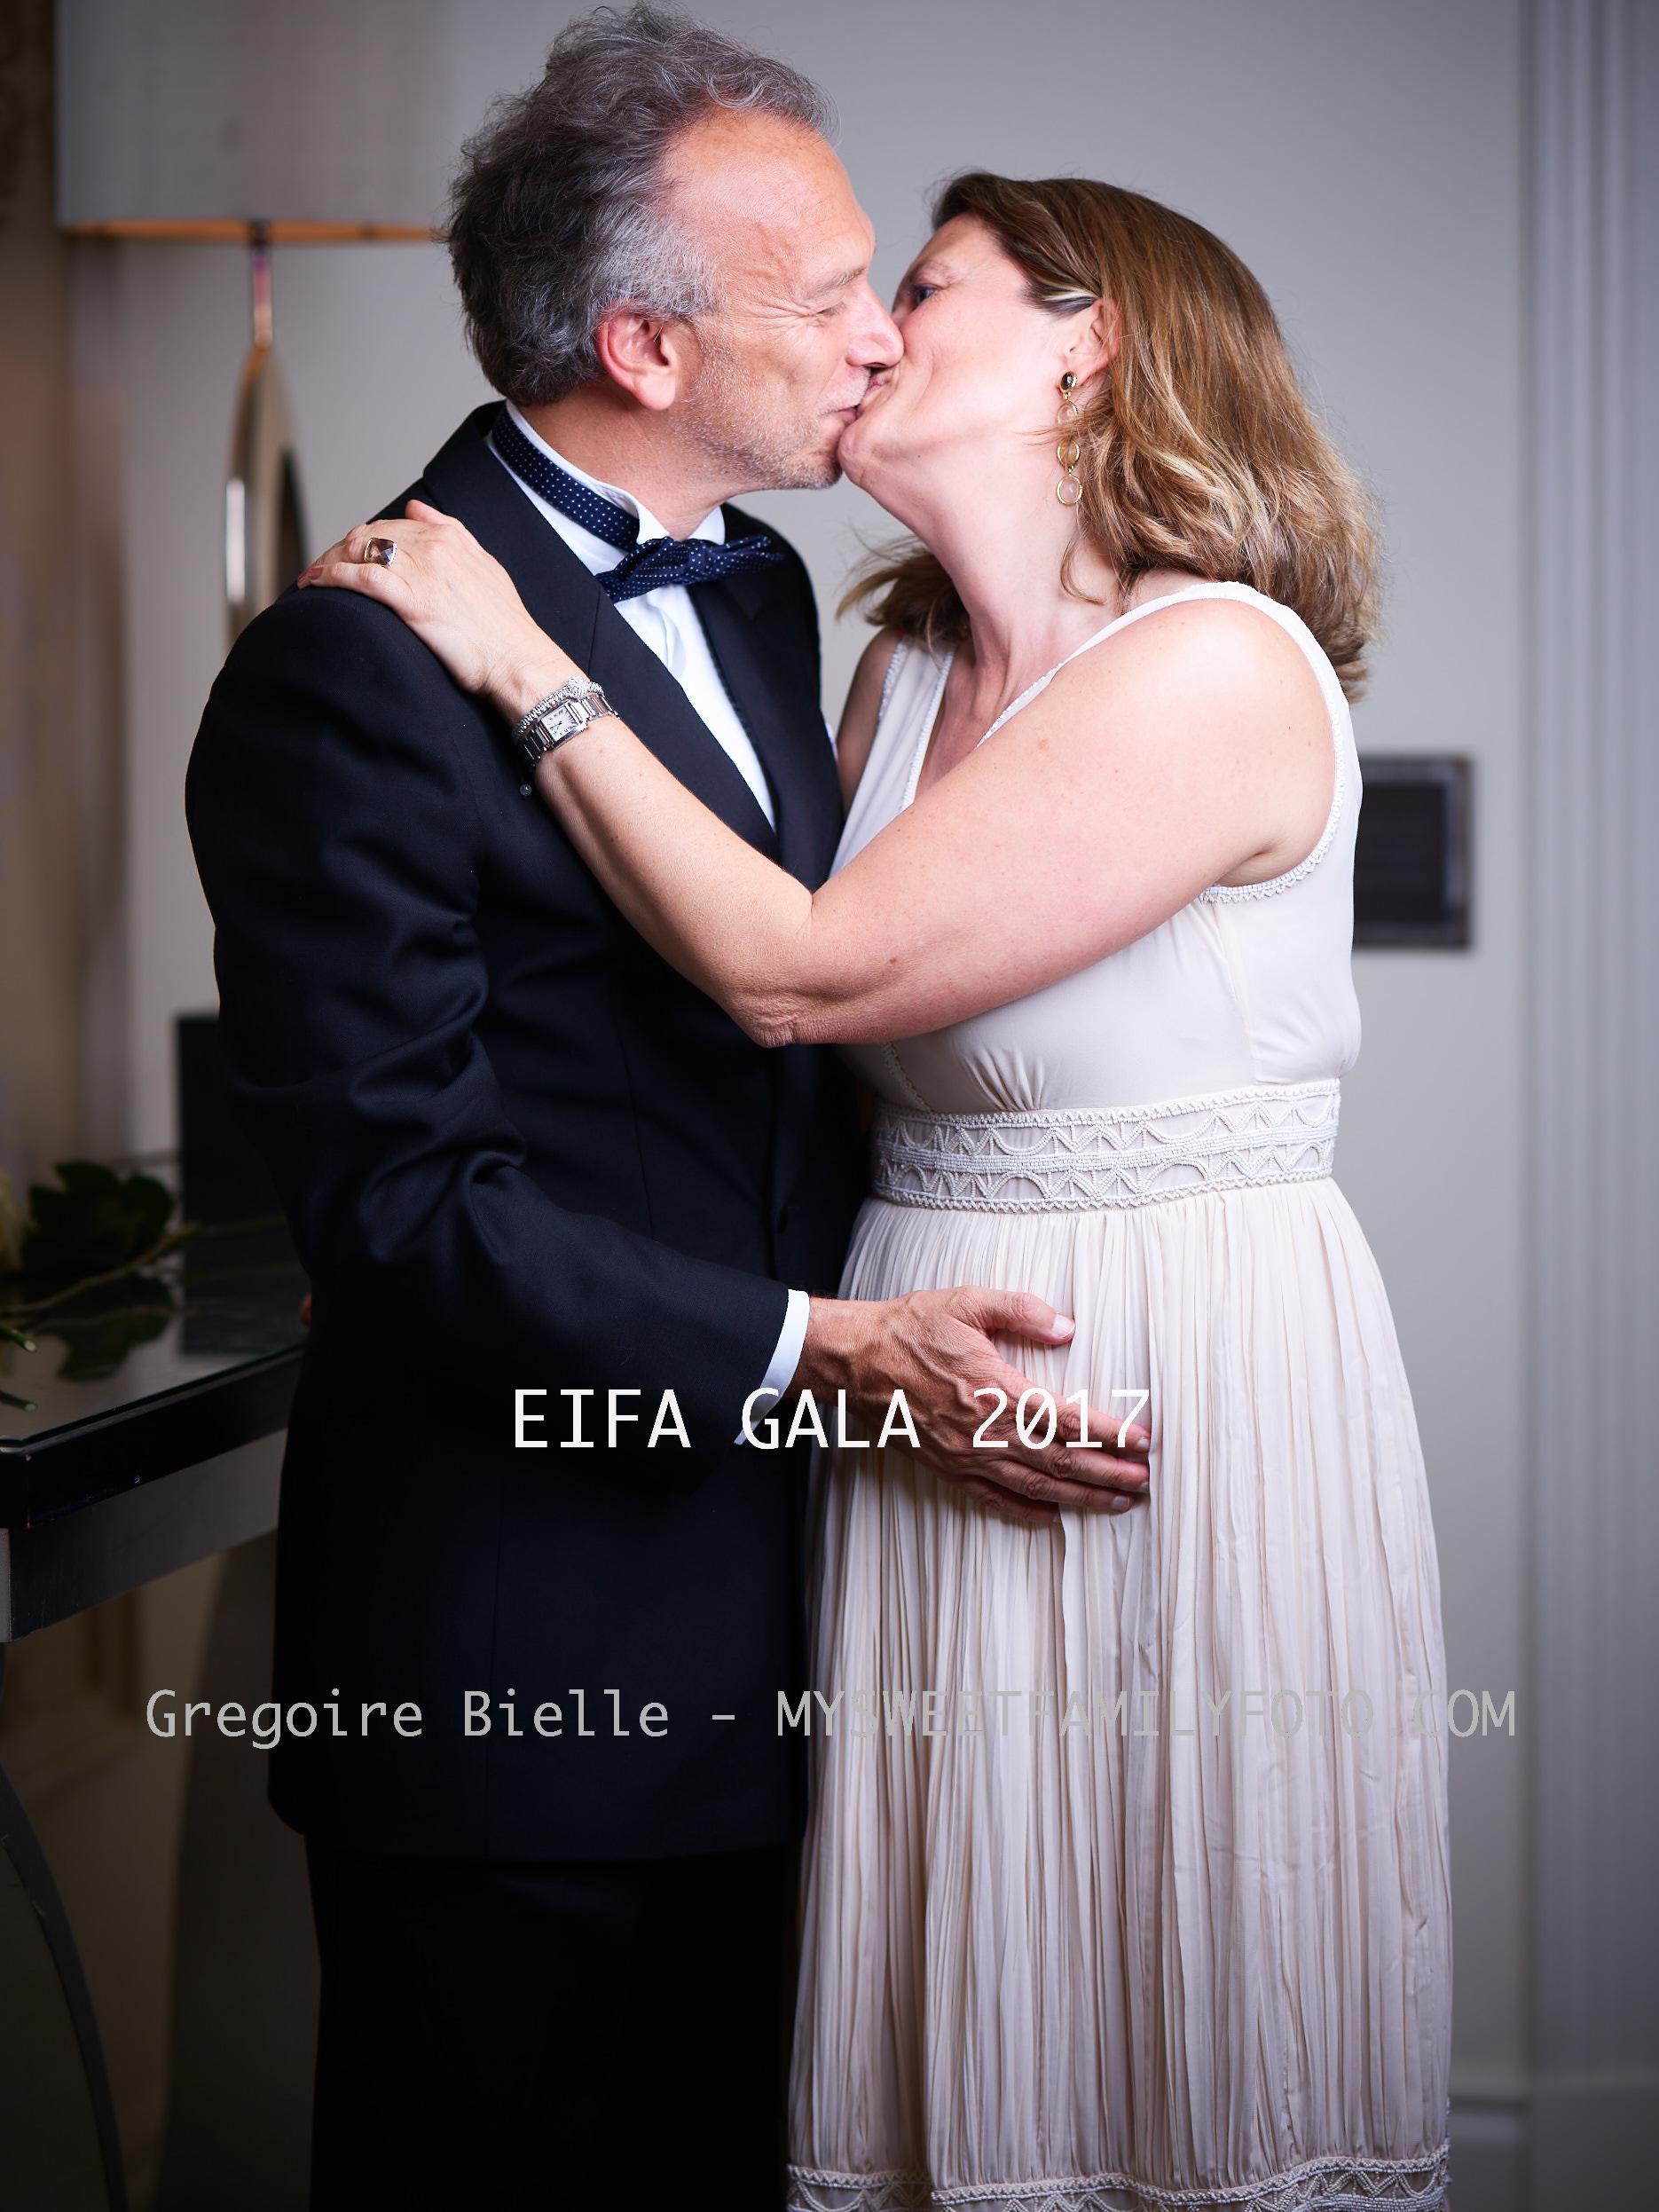 EIFA GALA 1315.jpg